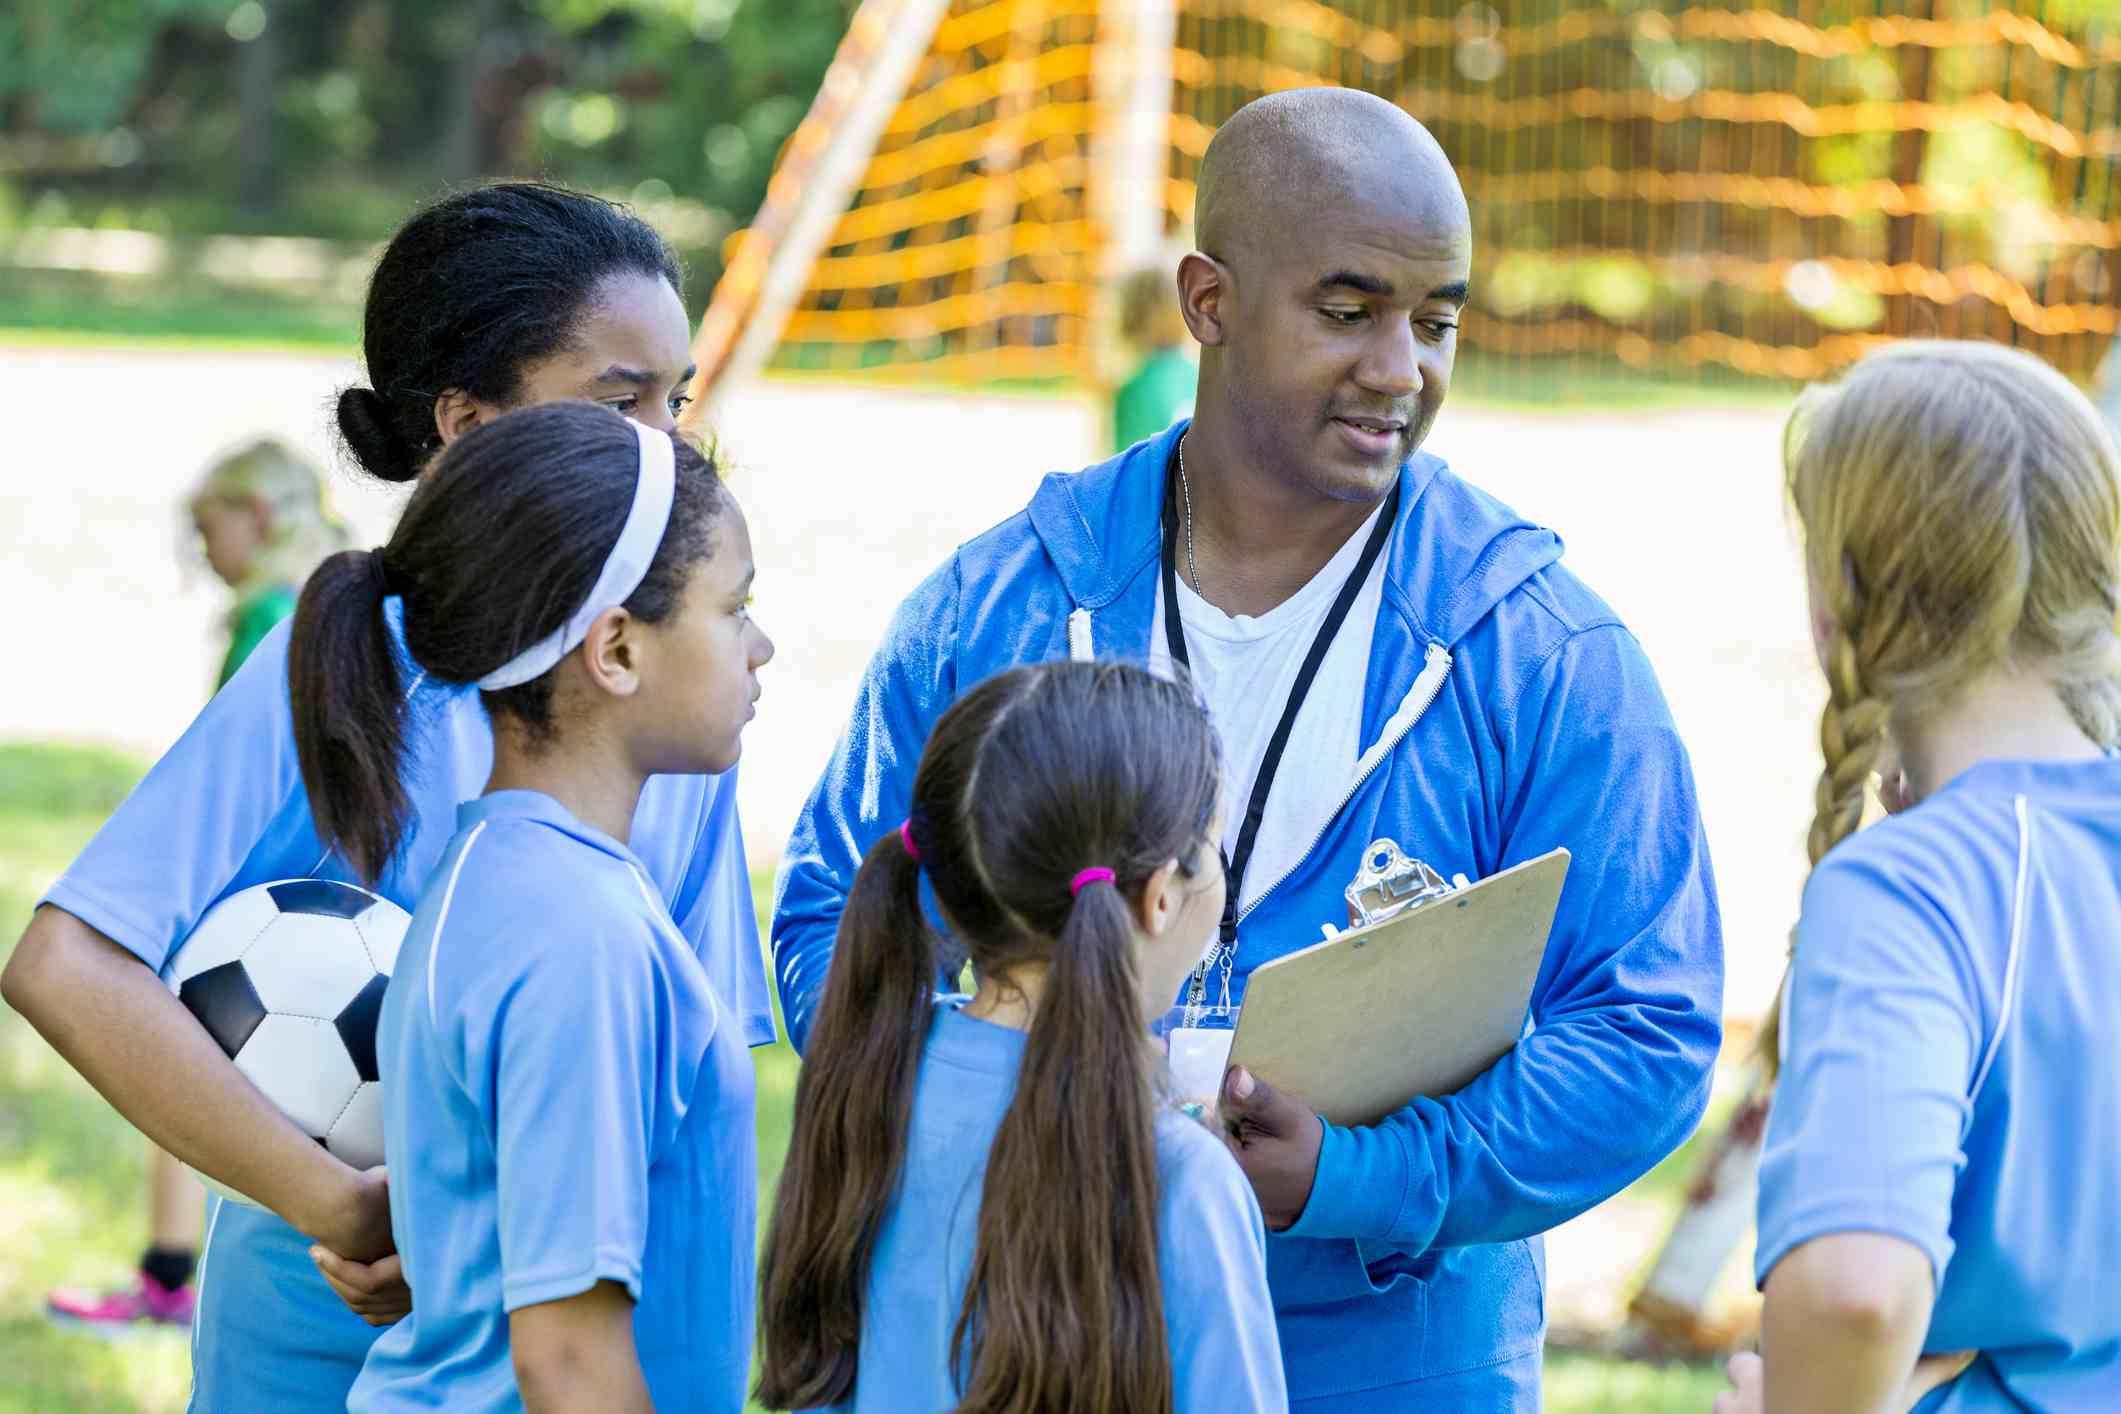 Girls talking to male soccer coach